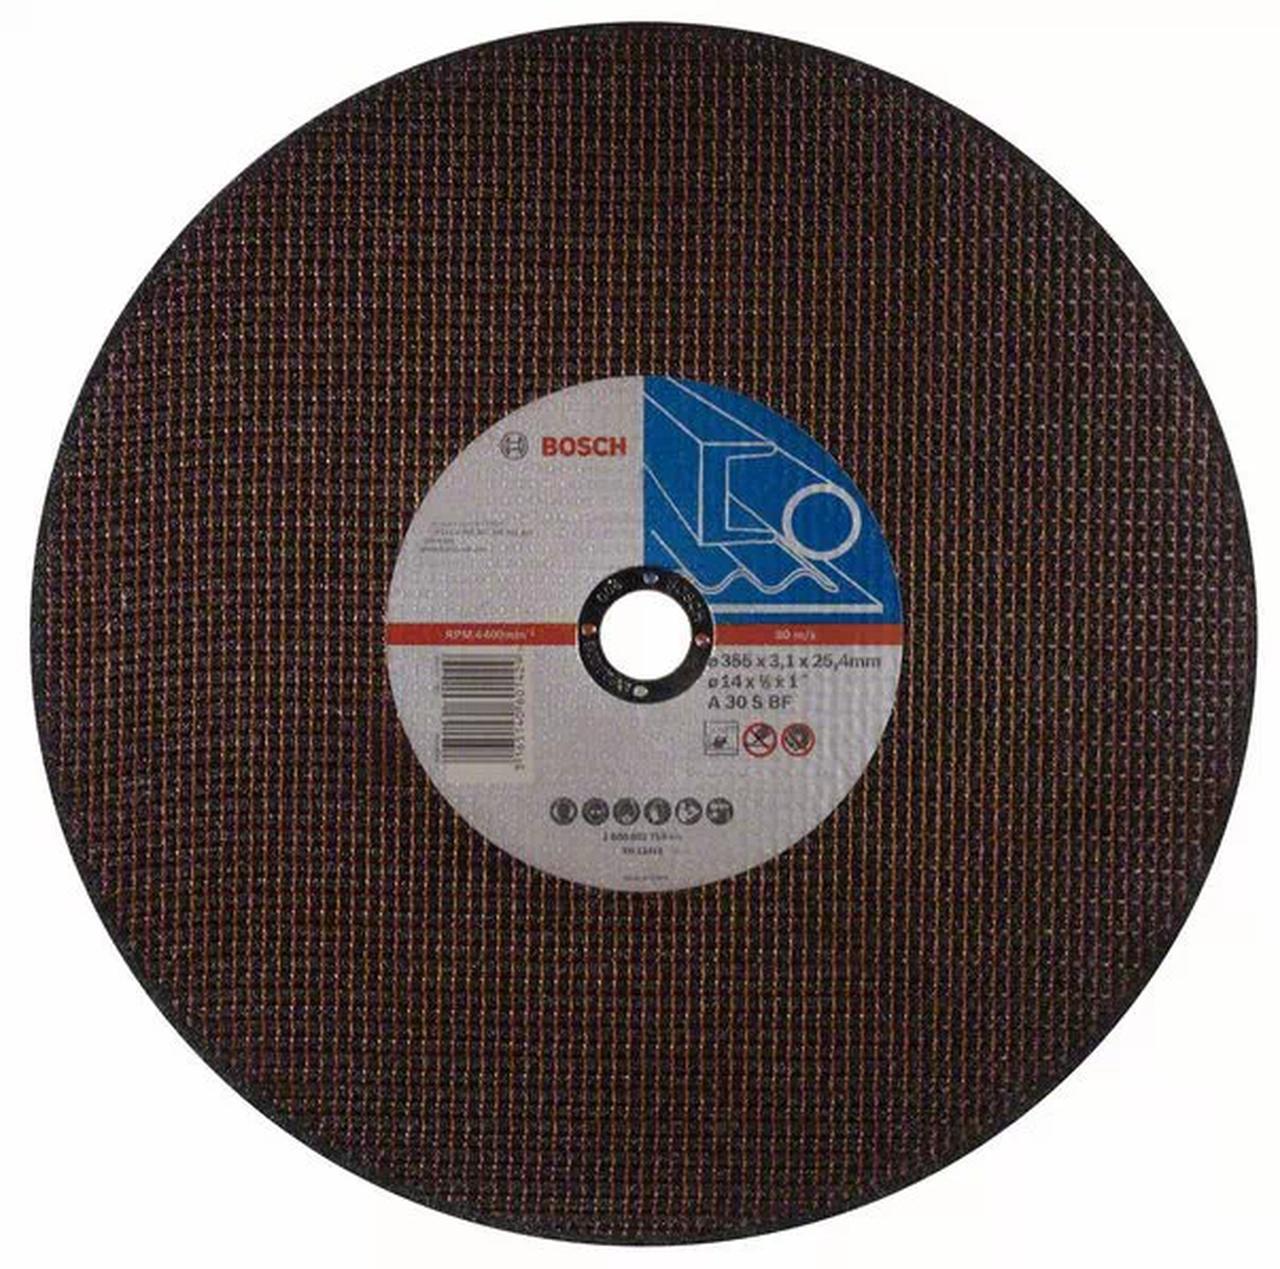 "Disco de corte metal 14"" 355 X 3,1 X 25,4mm Bosch 2608602759"